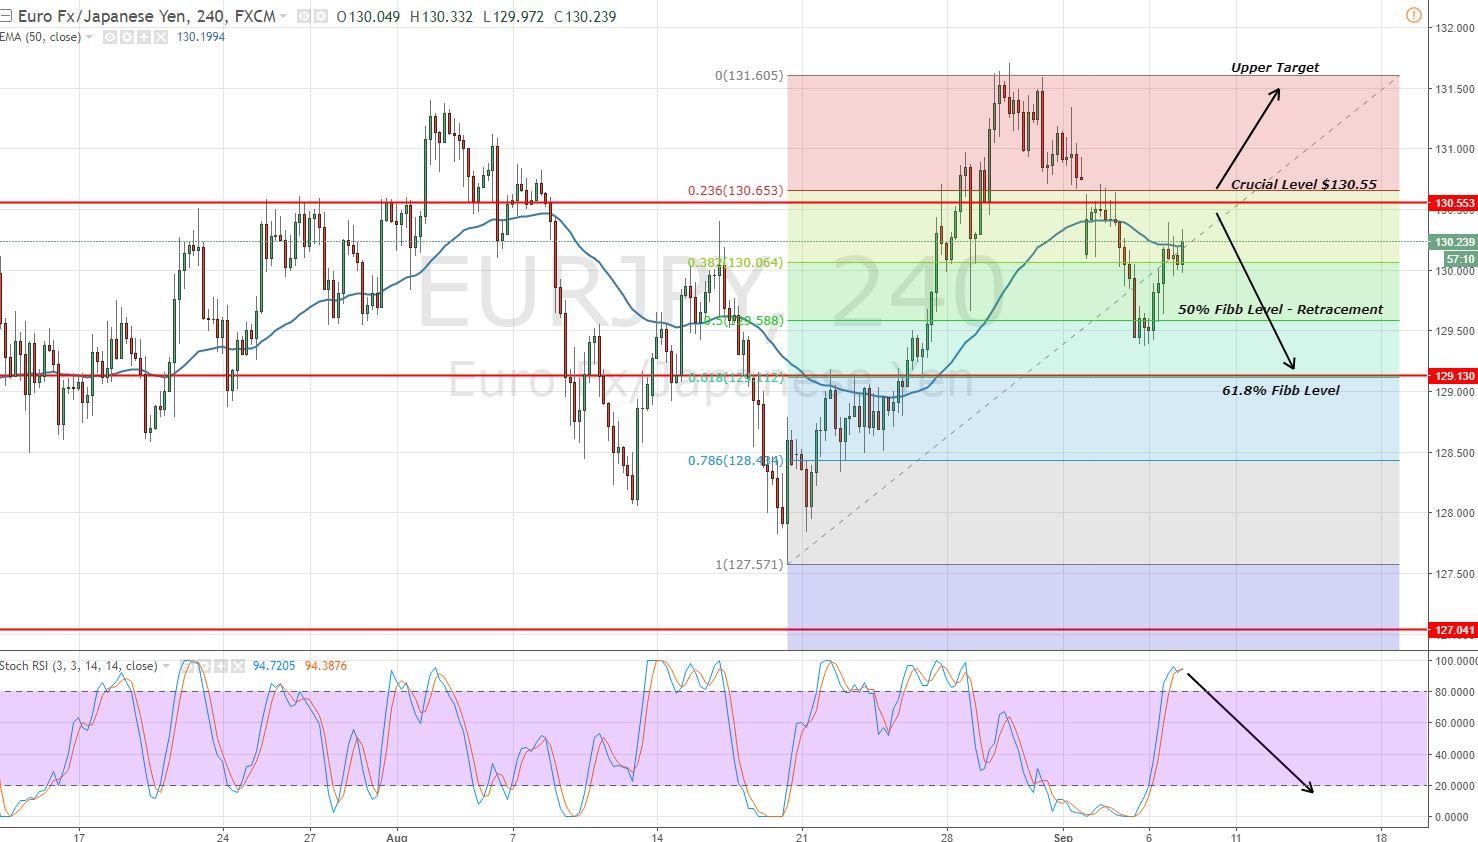 EURJPY - 4 Hour Chart - Fibonacci Retracement